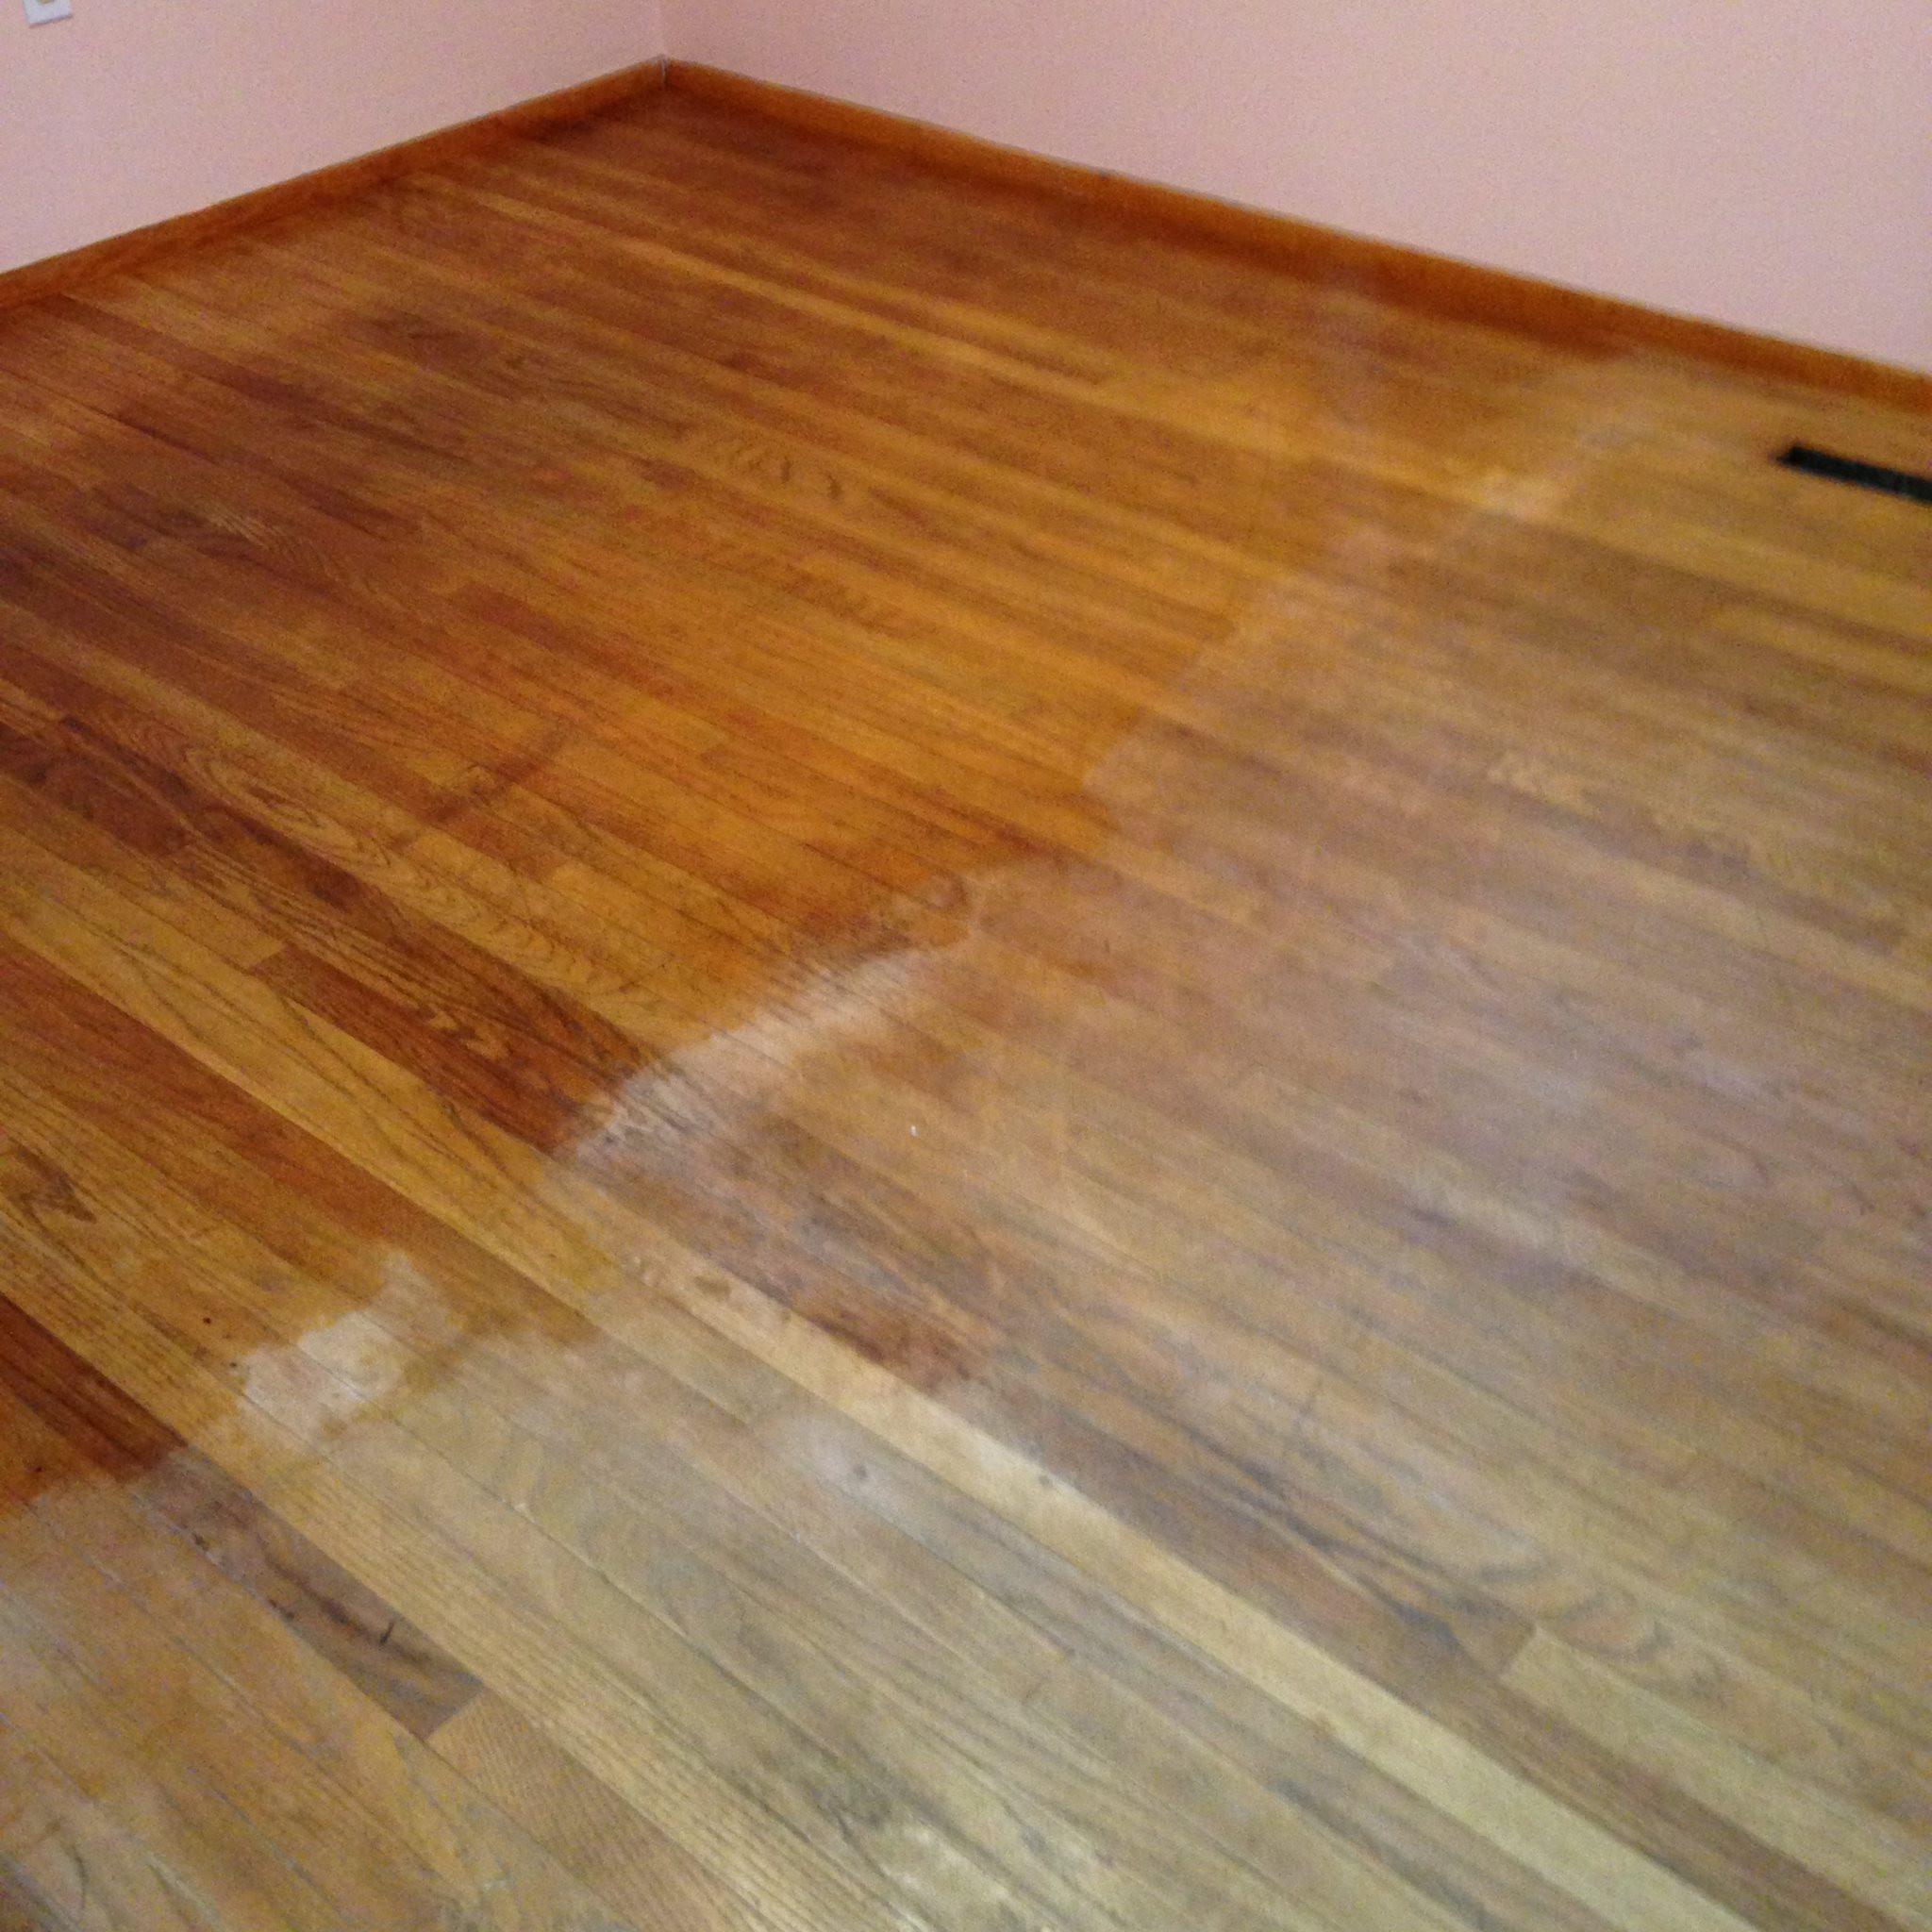 different types of hardwood floors of 15 wood floor hacks every homeowner needs to know in wood floor hacks 15